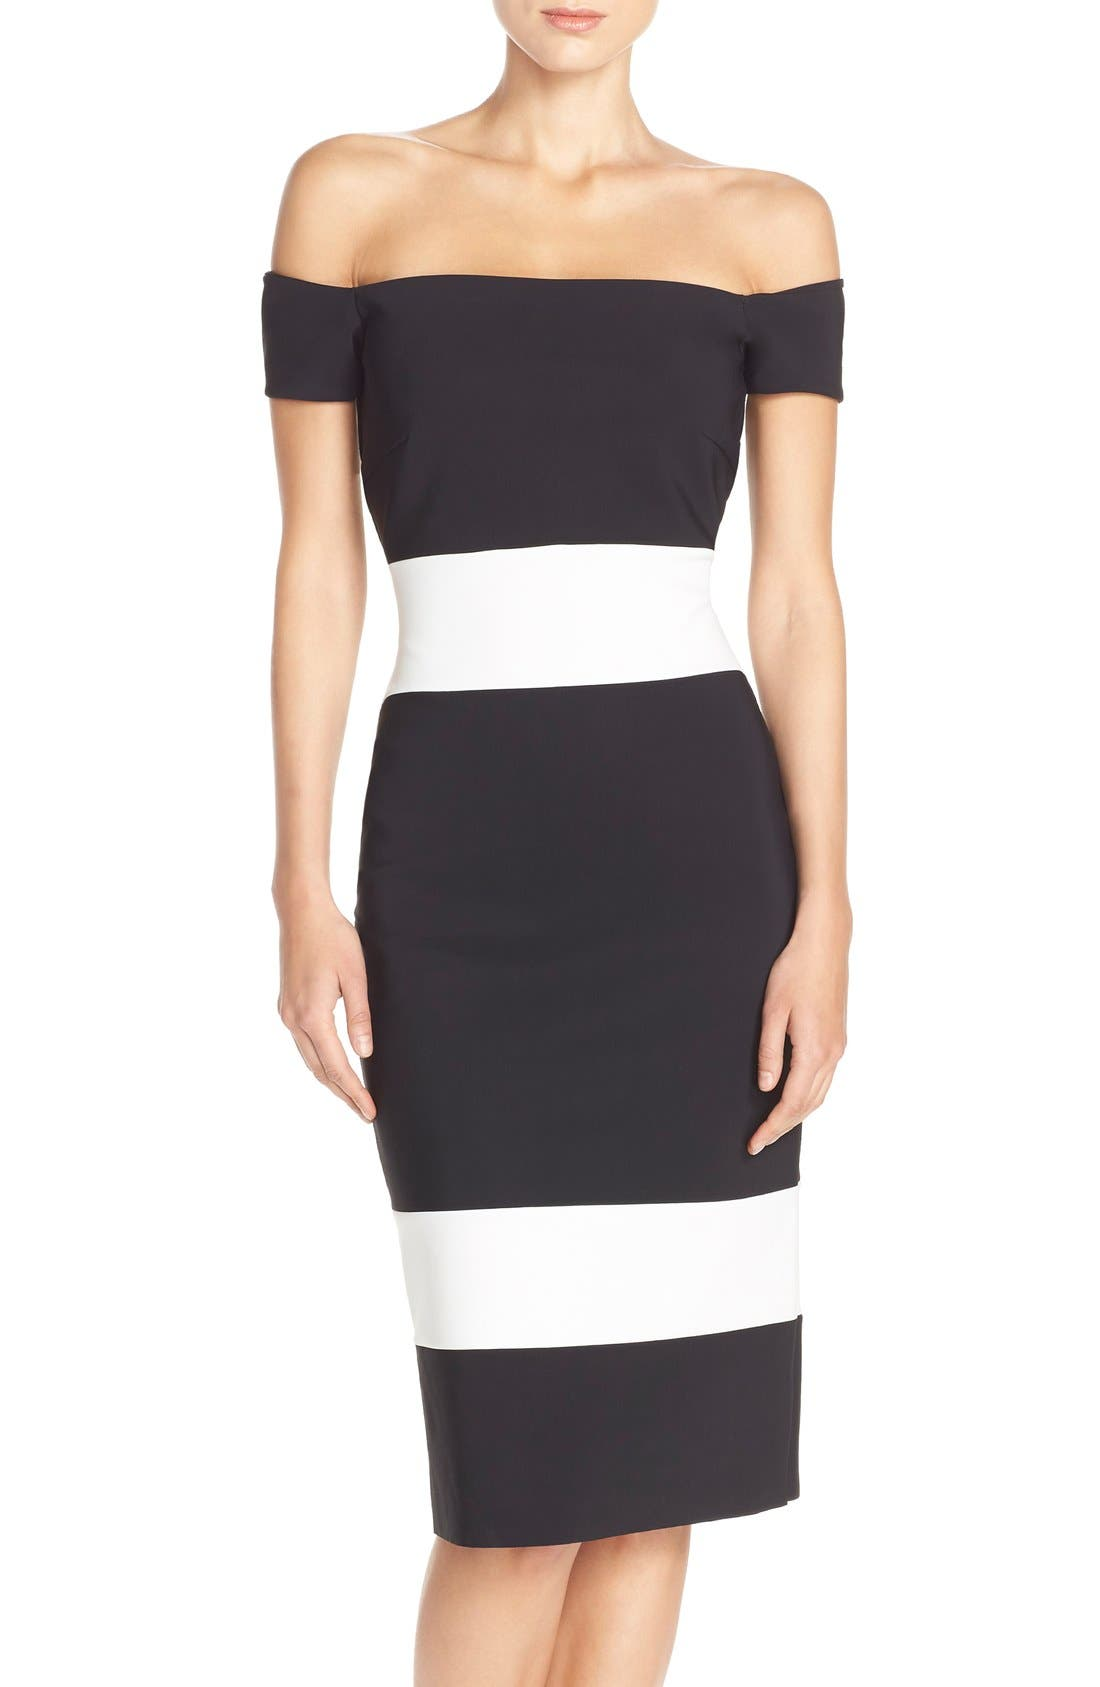 Alternate Image 1 Selected - Chiara Boni La Petite Robe 'Bebel' Stripe Jersey Sheath Dress